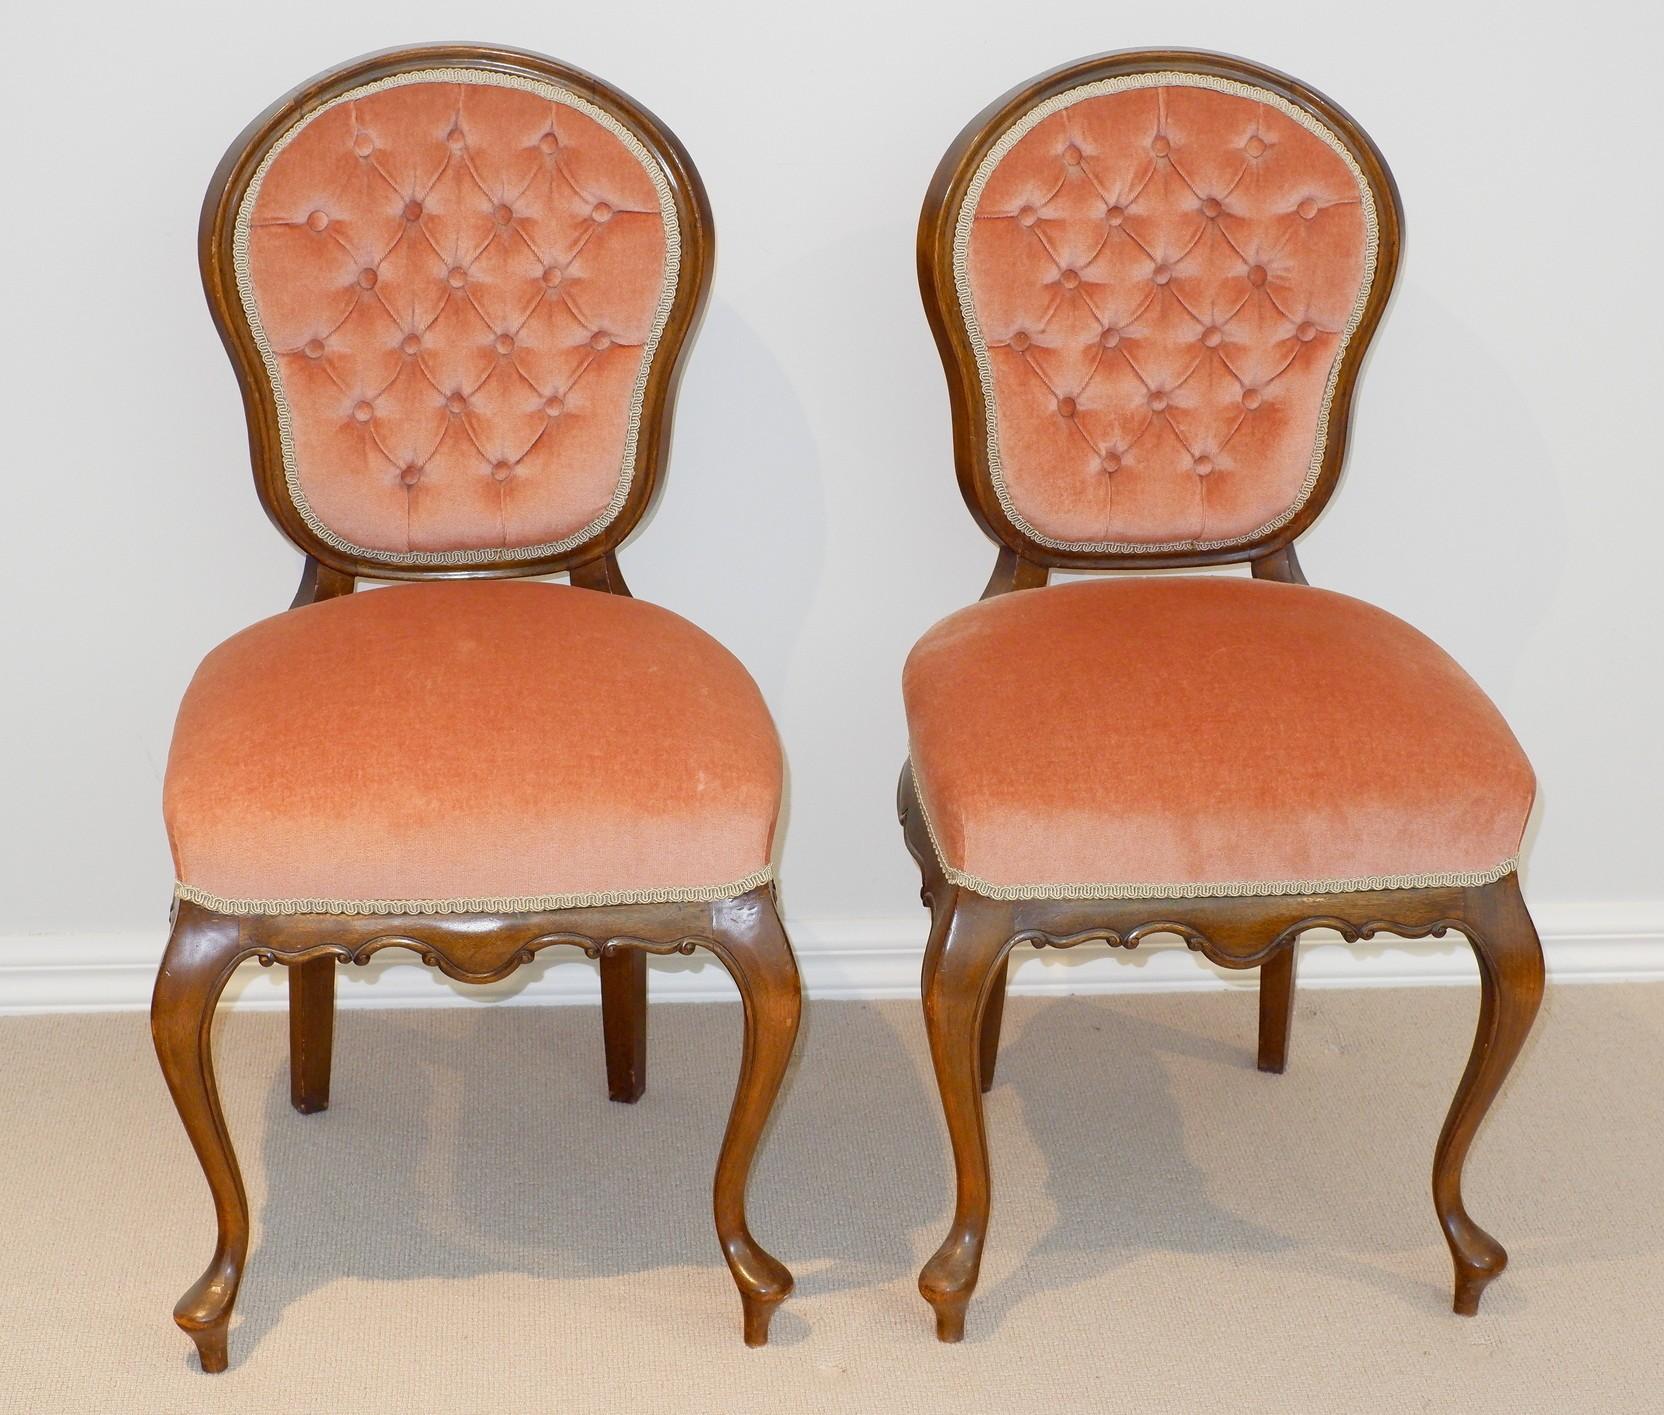 'Louis Style Salon Chairs'